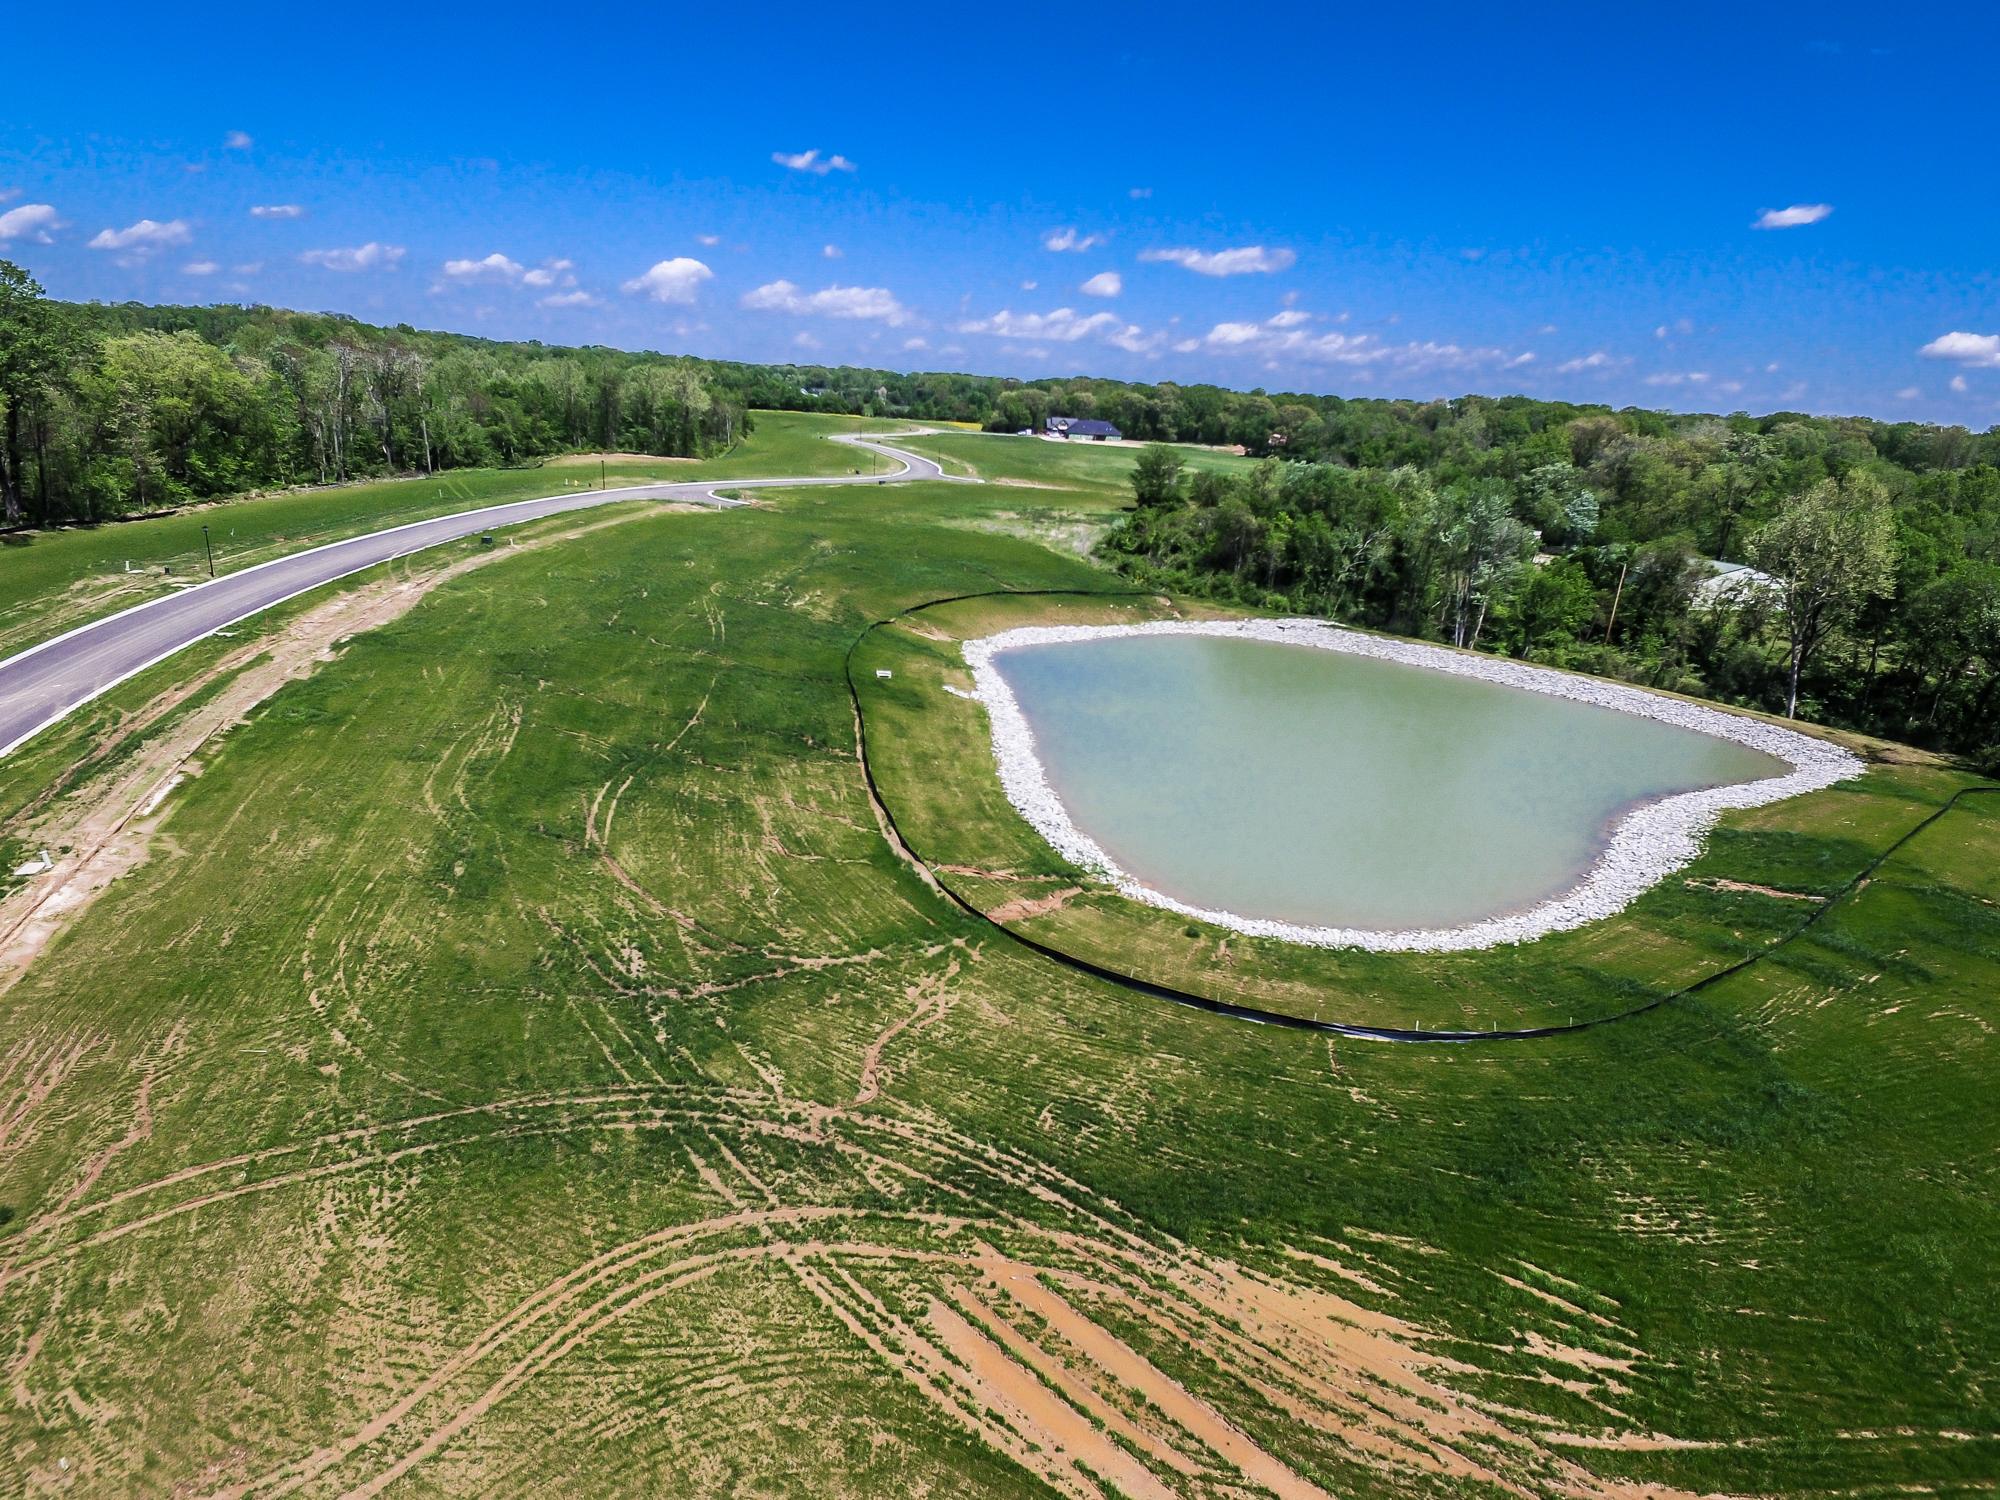 Bethel_Ridge_Farms_O'Fallon_Illinois_Aerials_Progress_5.3.17-24.jpg